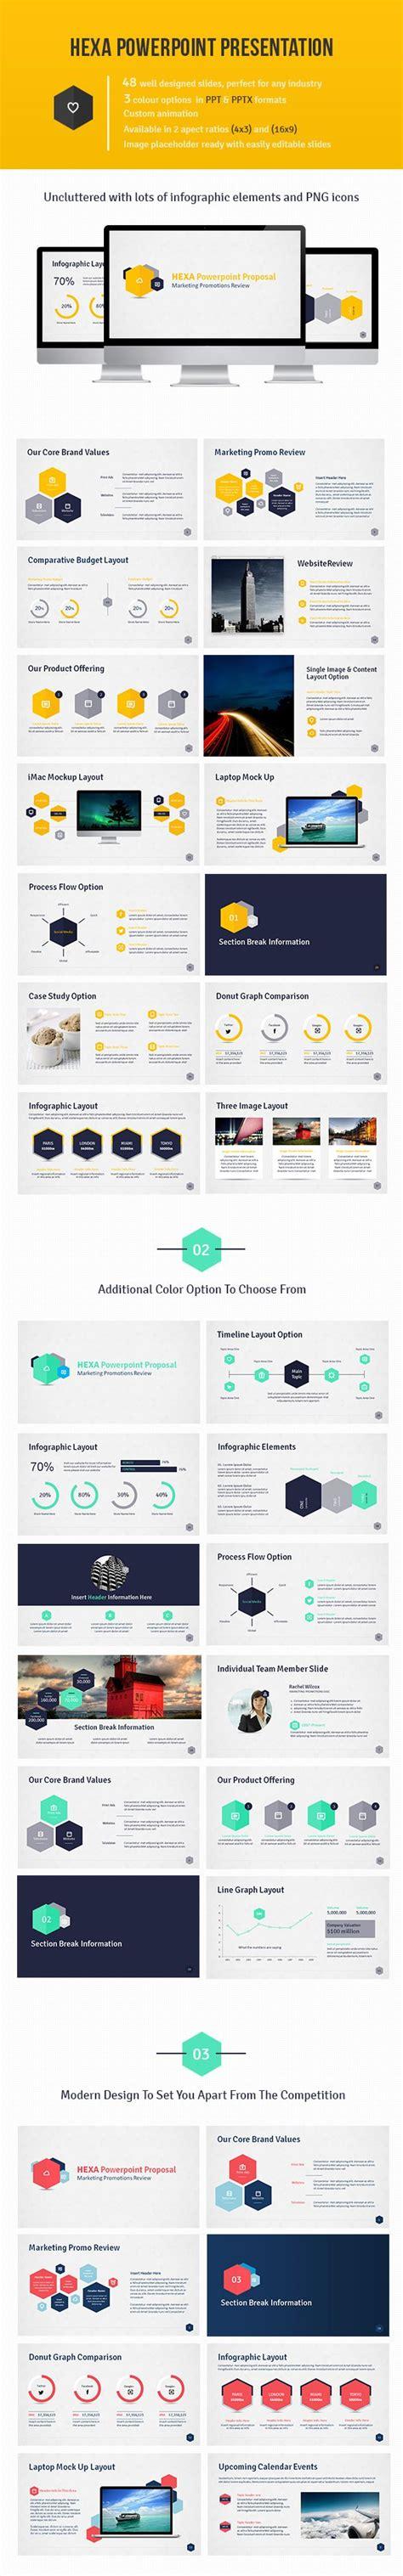 powerpoint template by design district via behance 56 best presentation design inspiration images on pinterest